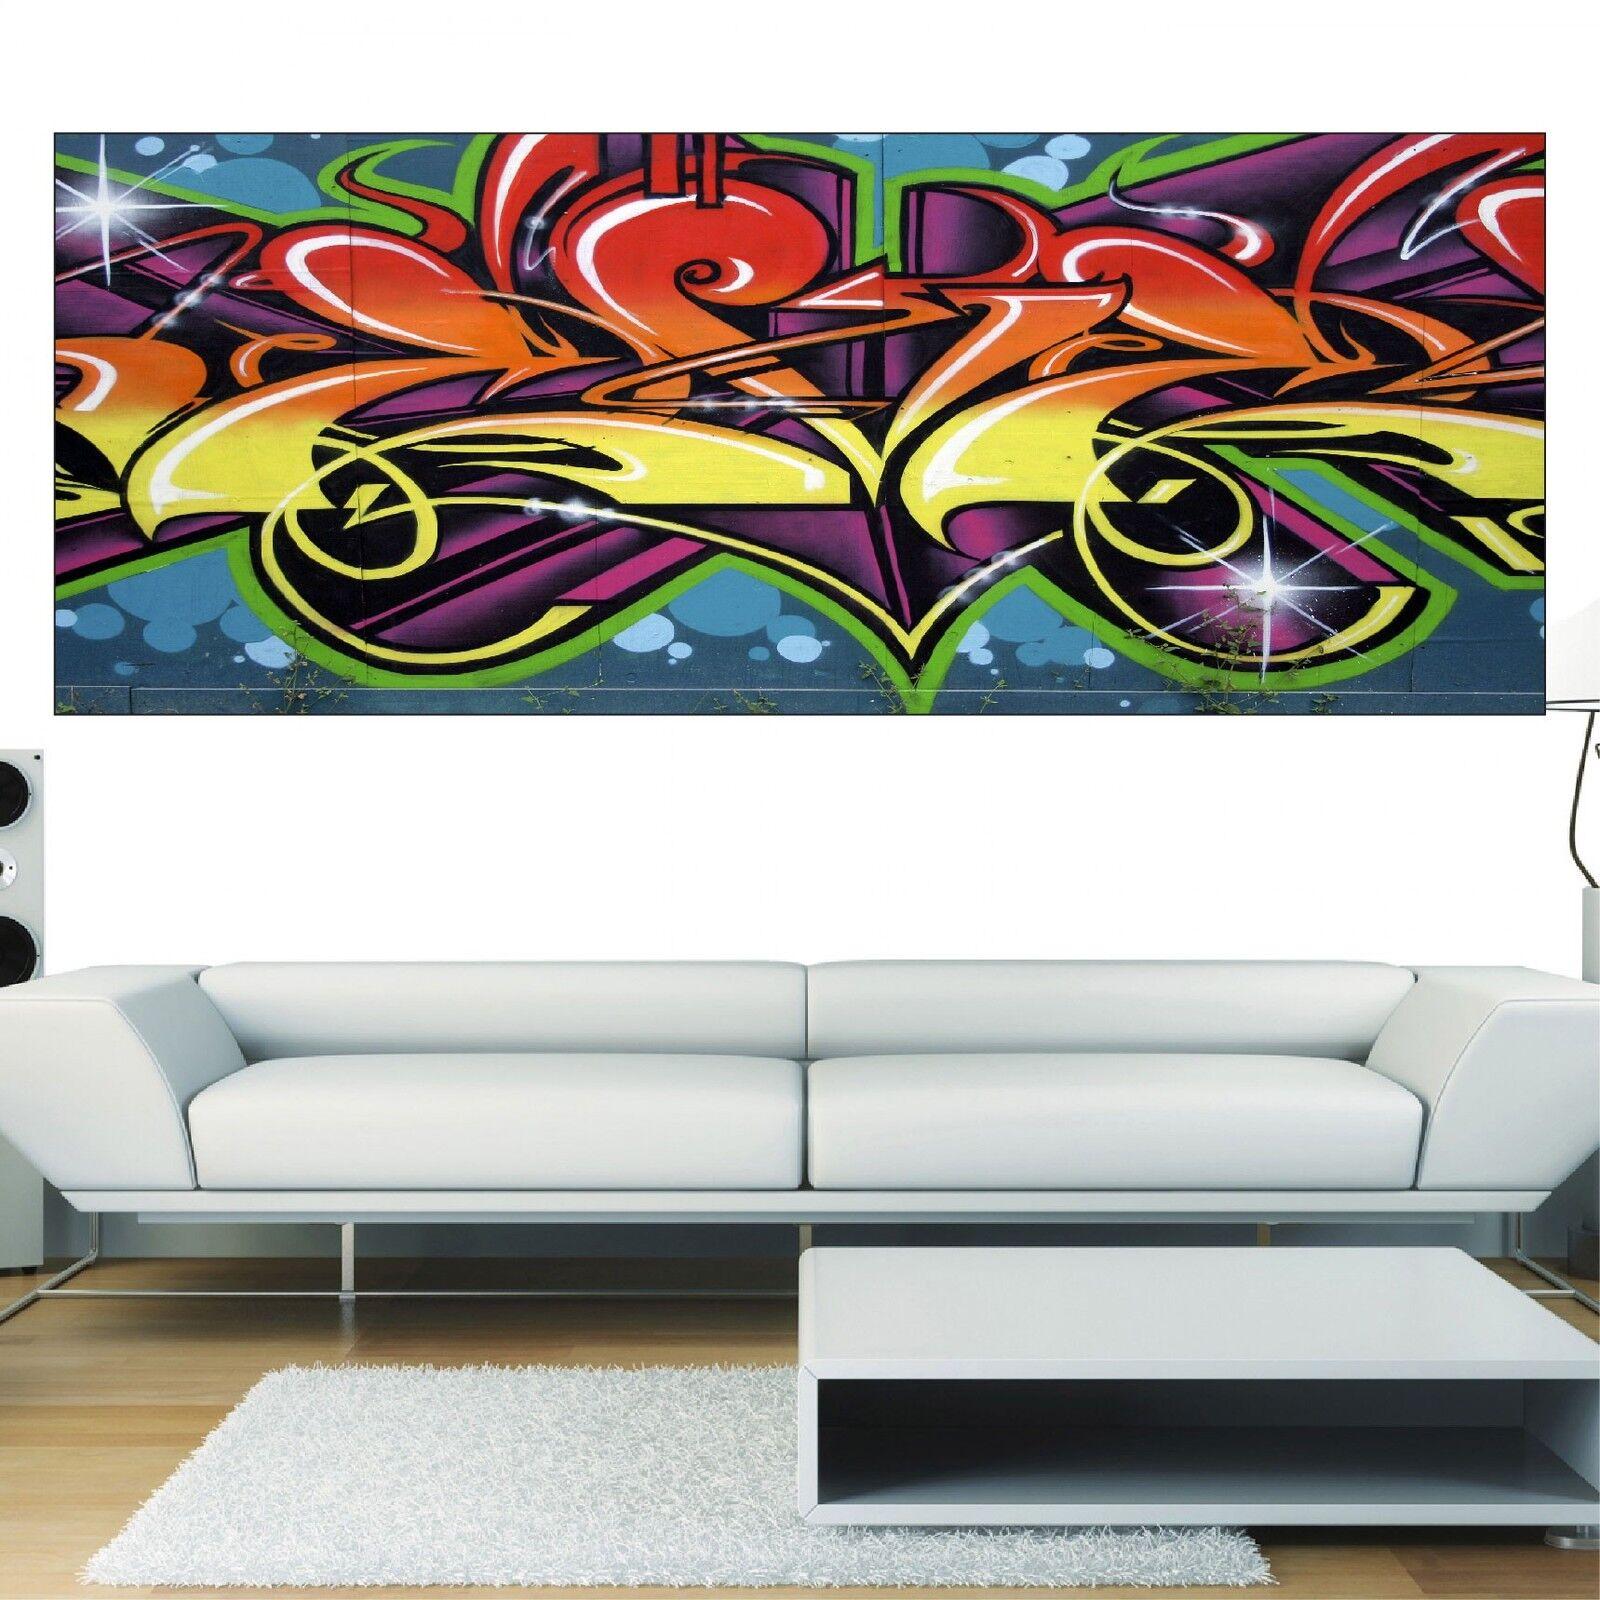 Papel pintado panorámica Tag 3630 Arte decoración Pegatinas